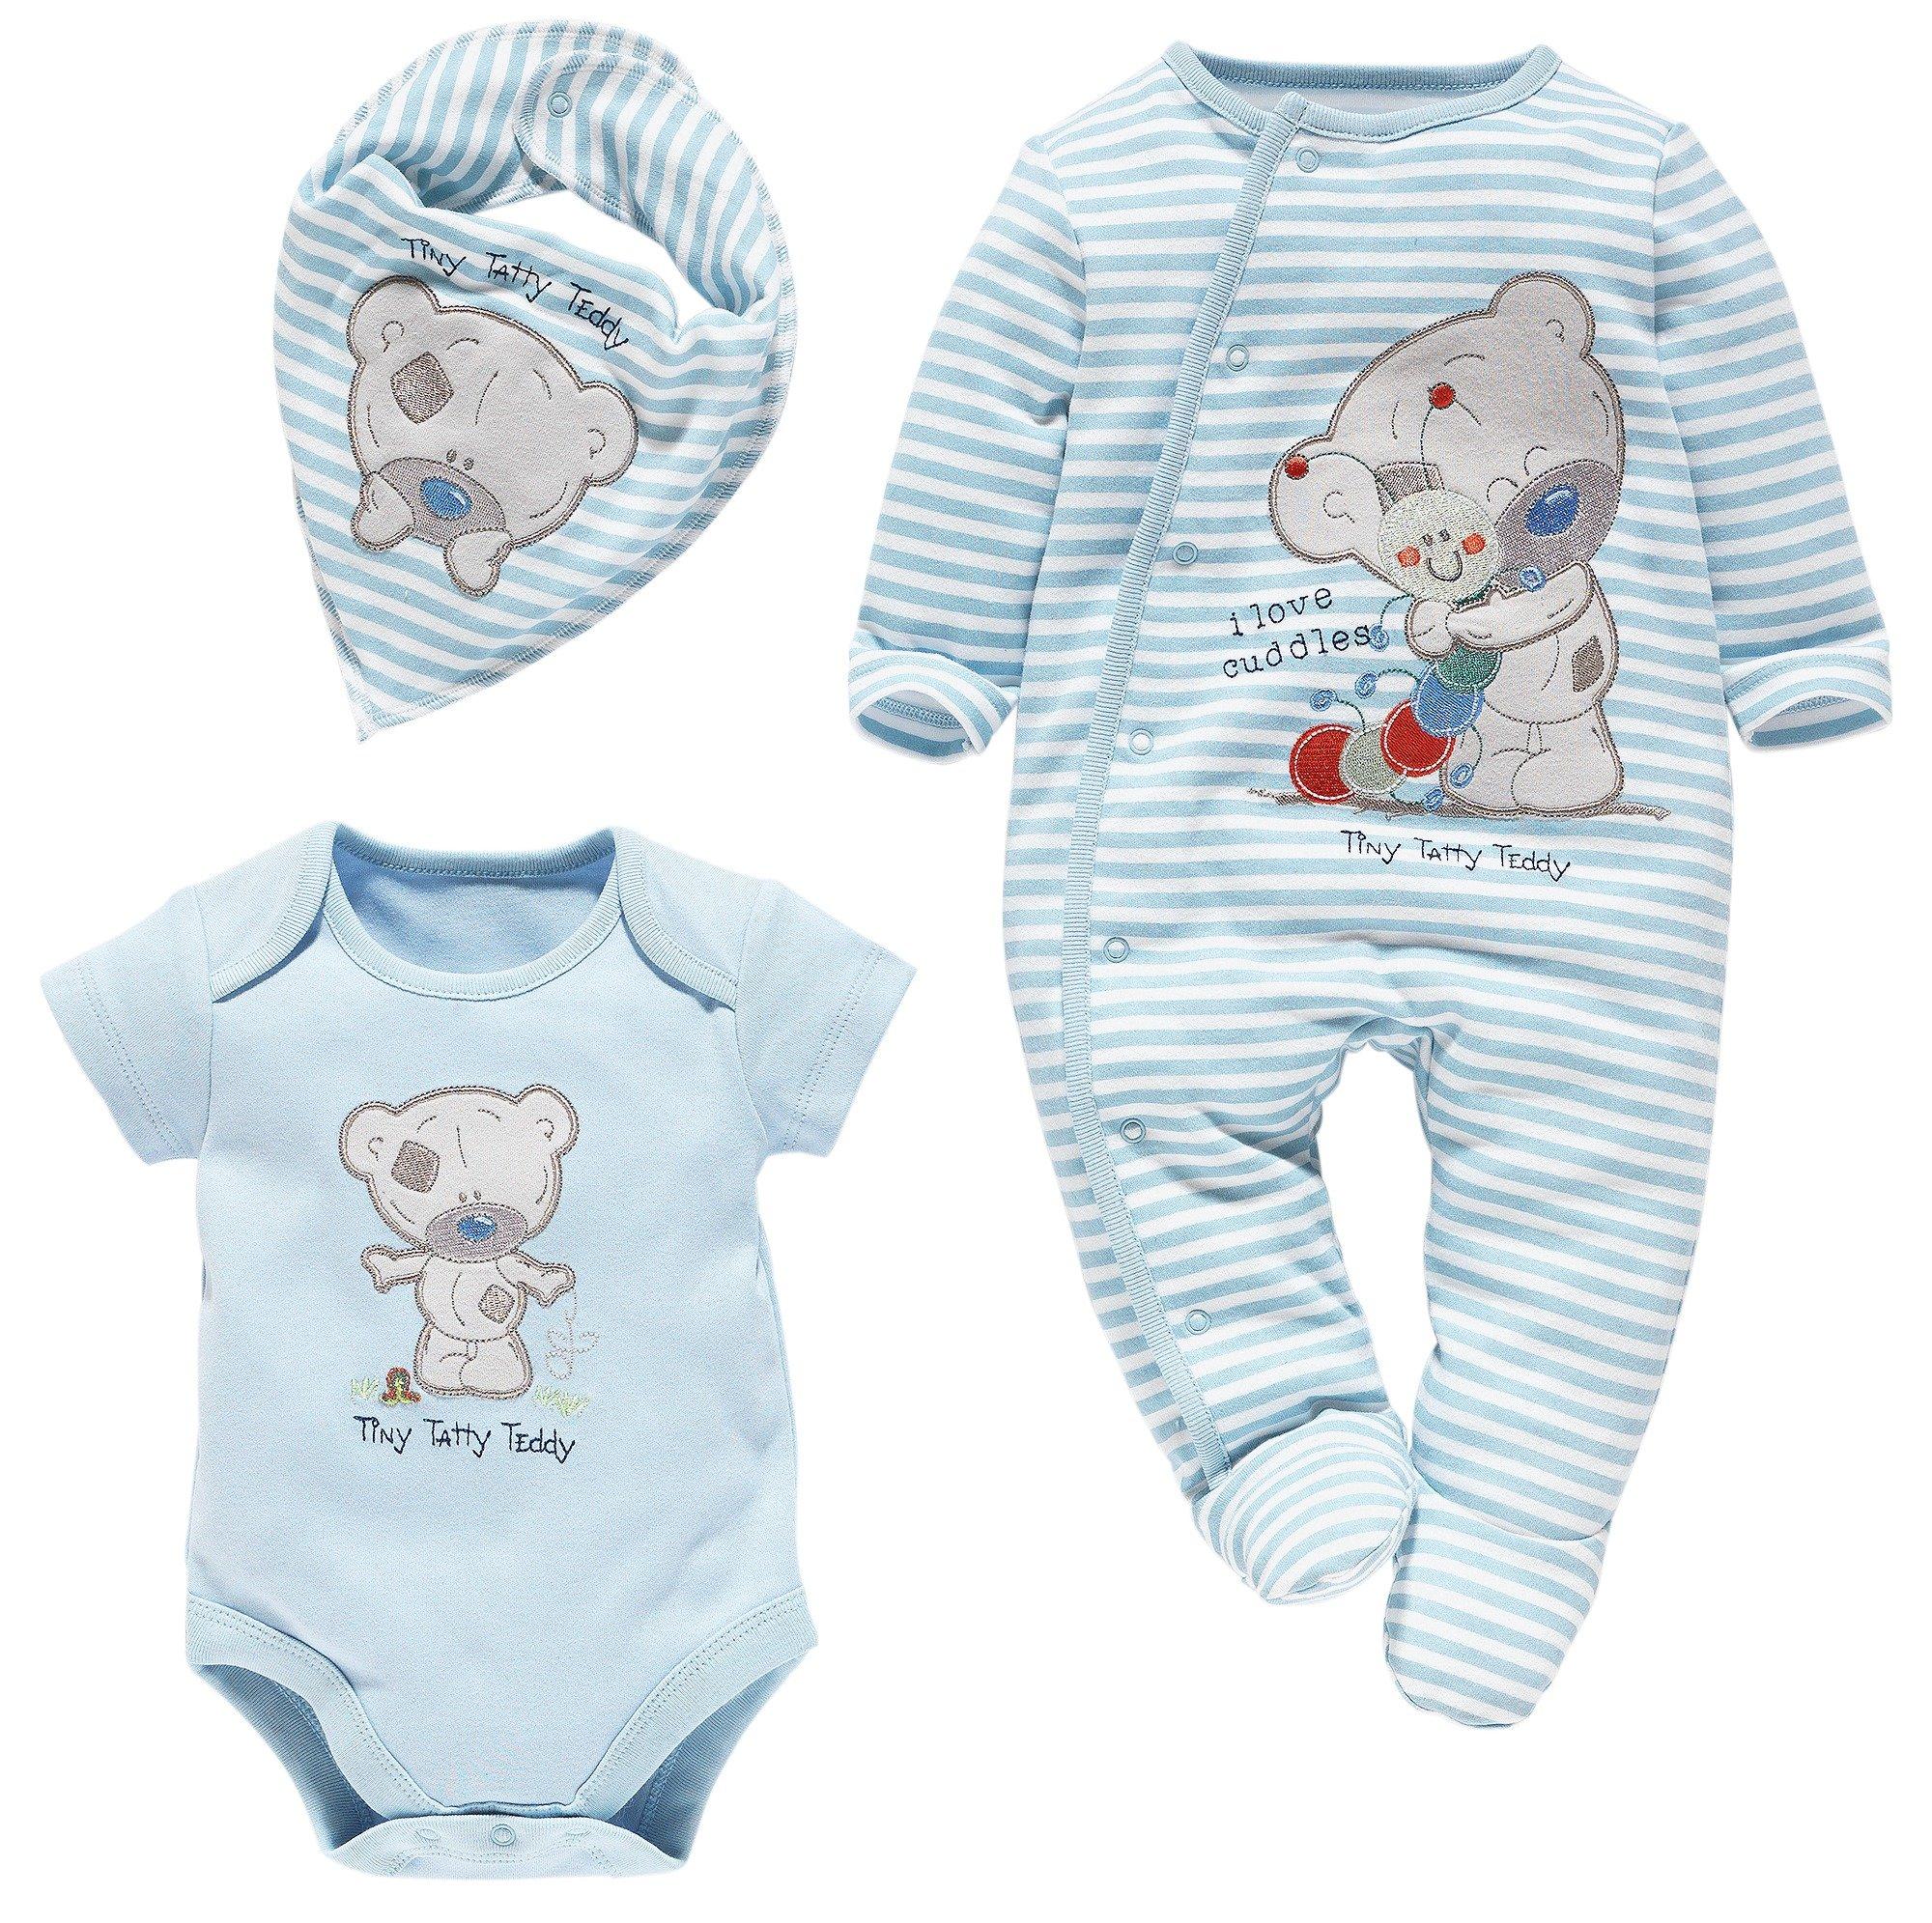 tiny-tatty-teddy-blue-gift-set-3-6-months